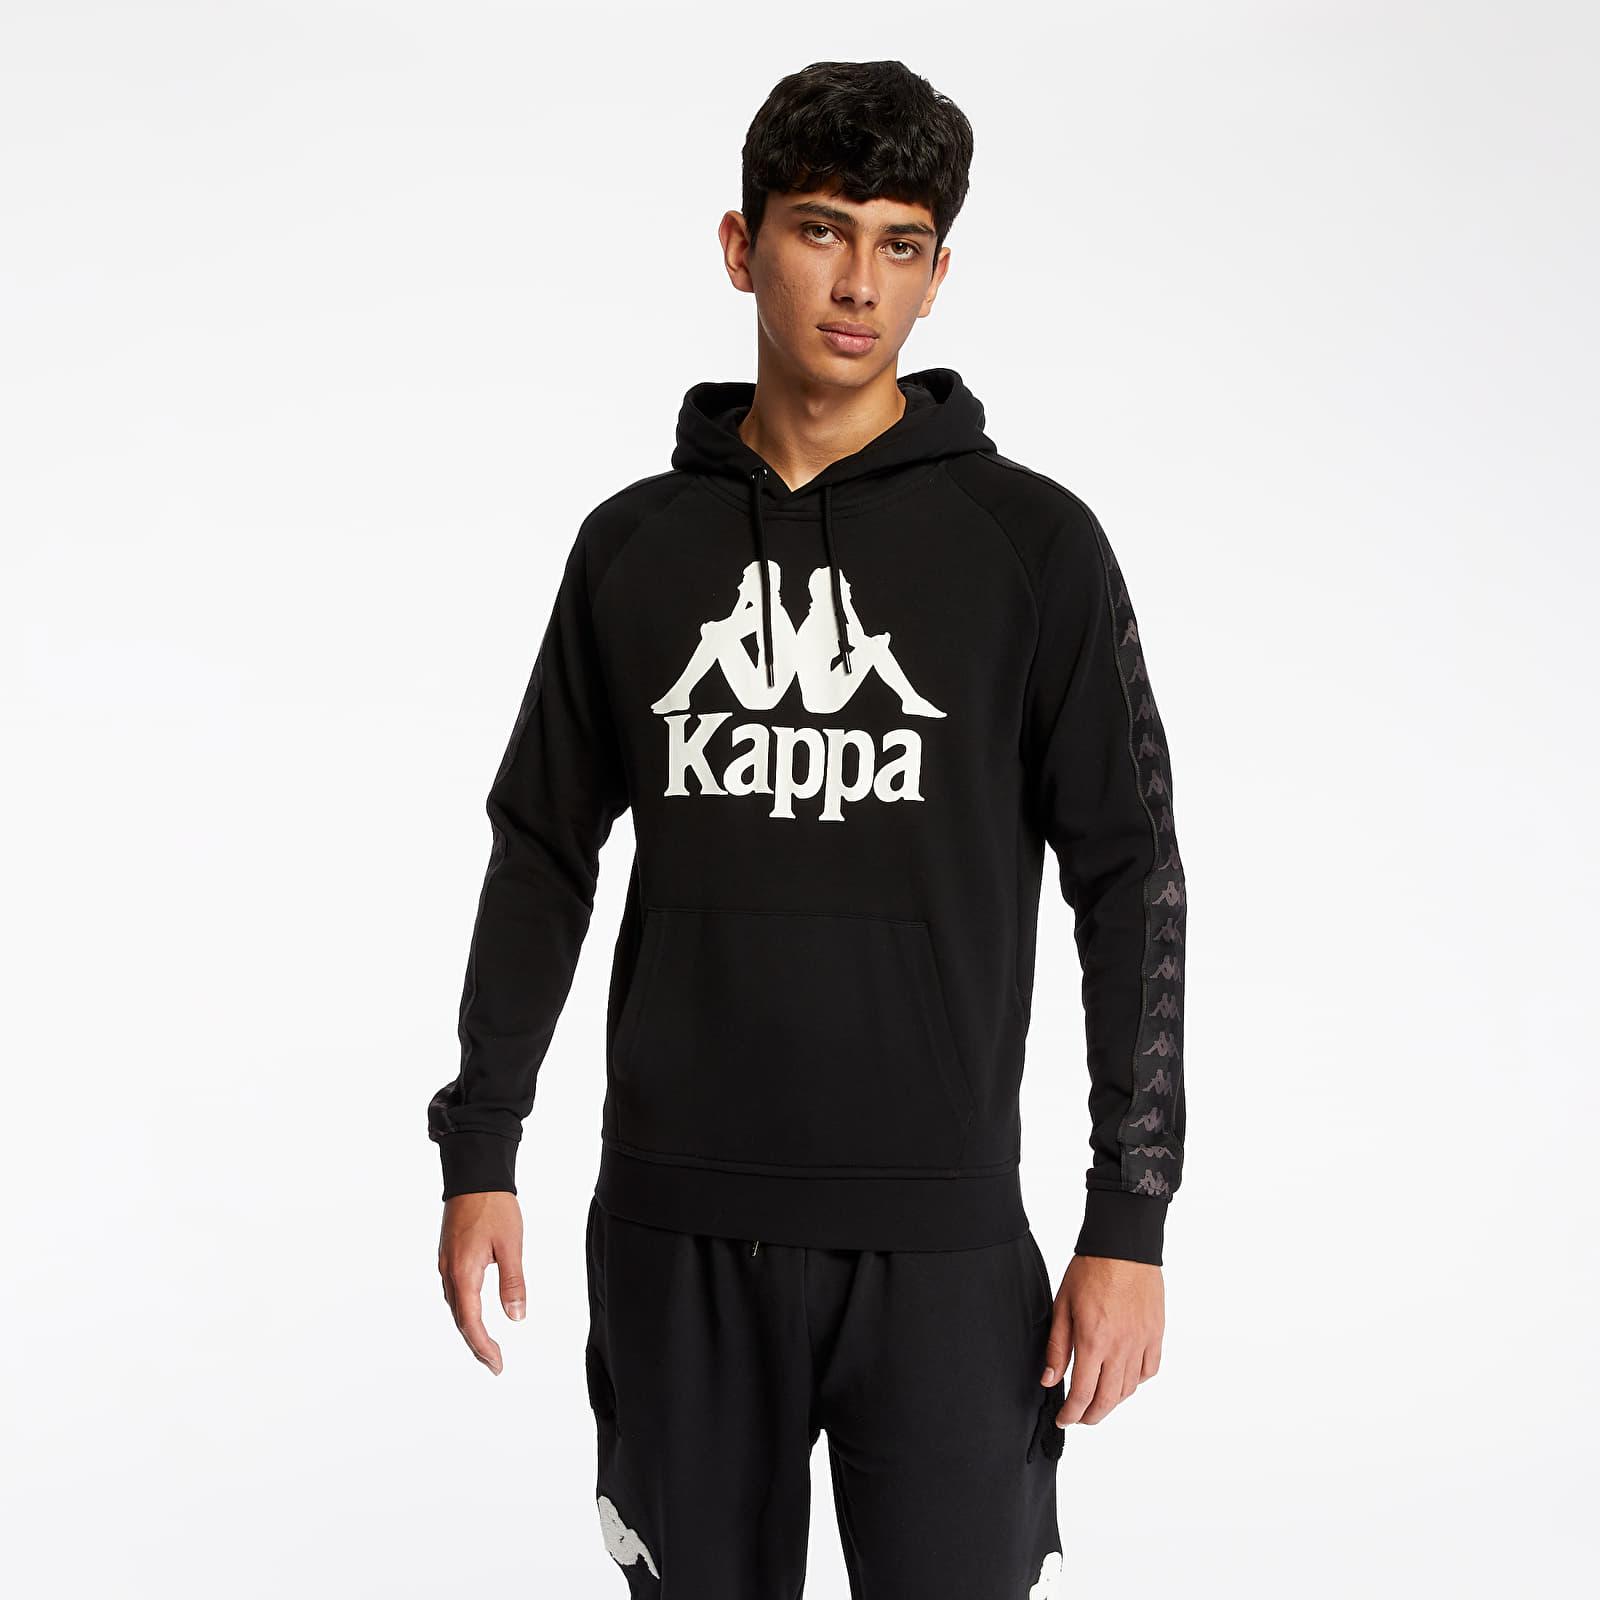 Sweatshirts Kappa 222 Banda Hurtados Hoodie Black/ White Antique